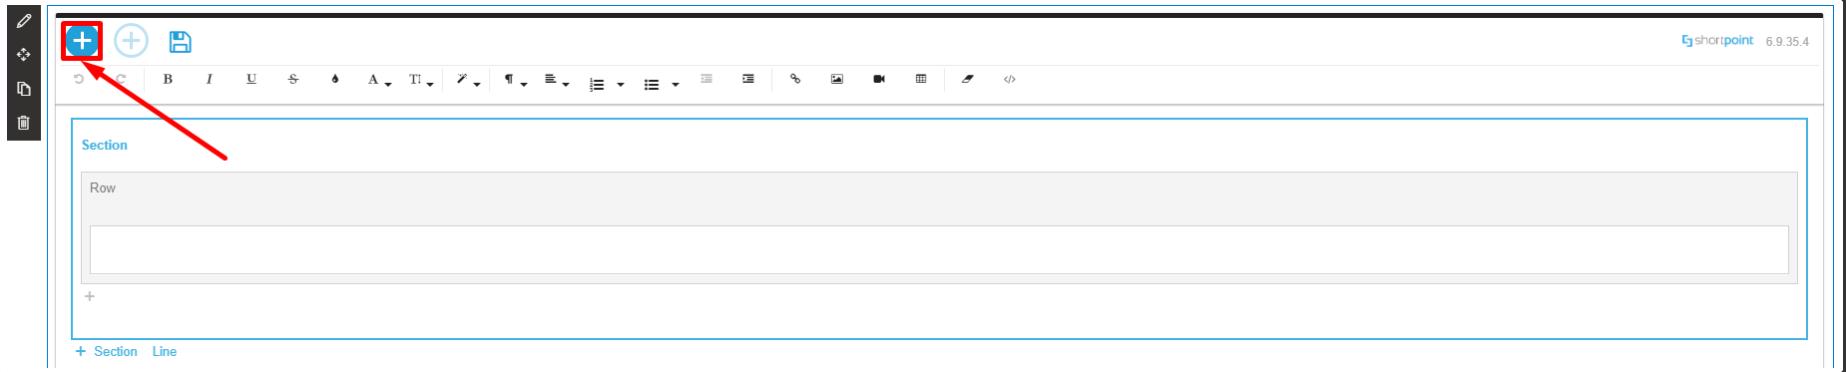 Open ShortPoint Page Builder